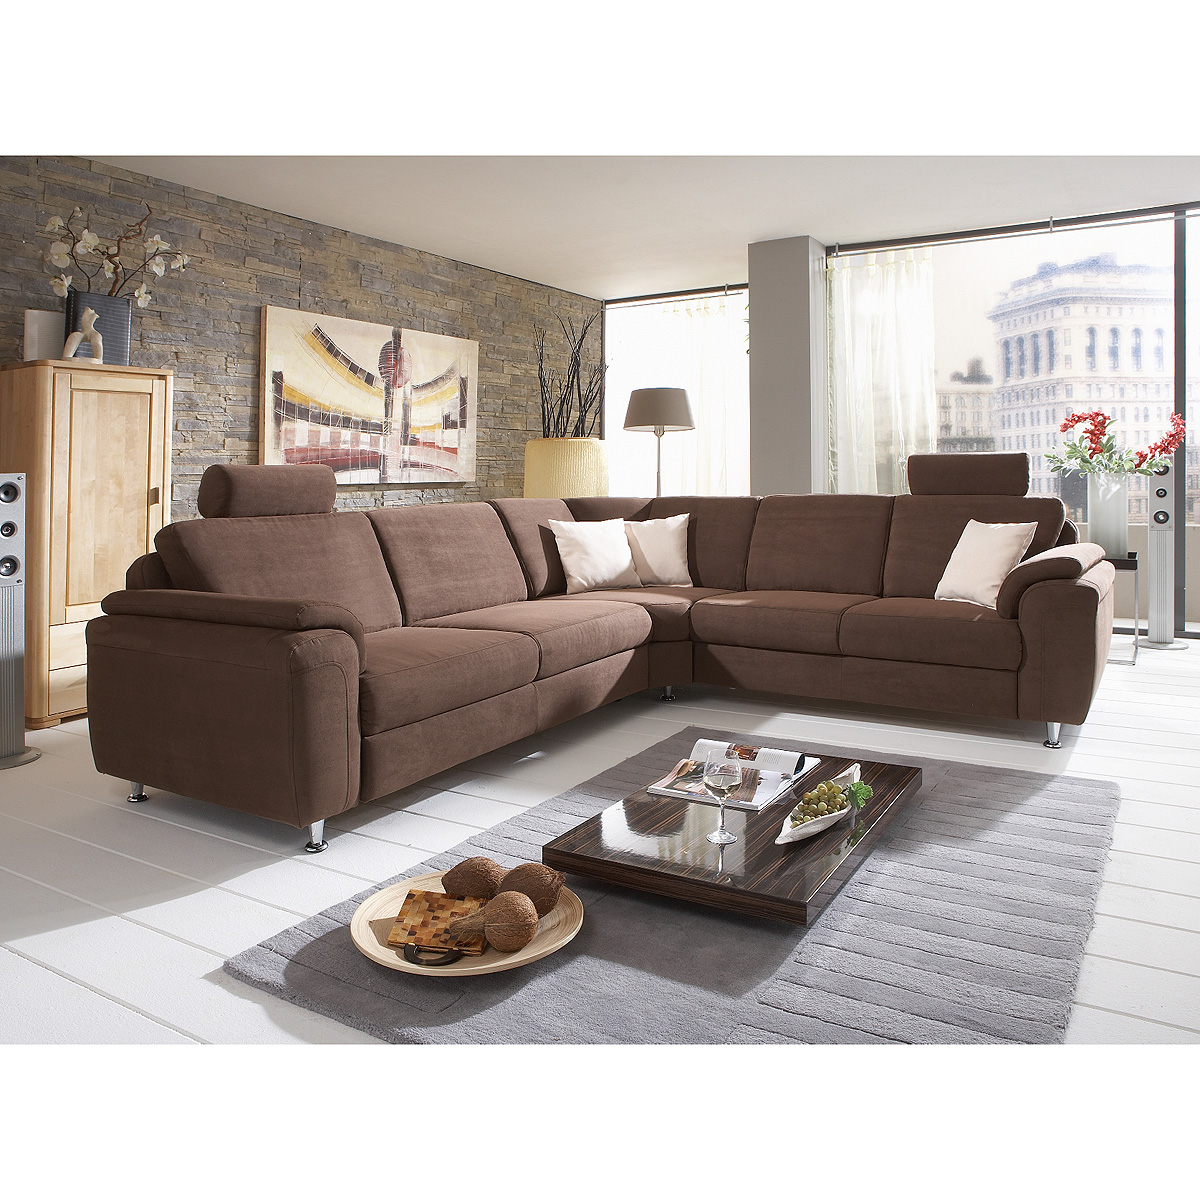 Ecksofa oxfort wohnlandschaft sofa polsterm bel stoff in for Ecksofa braun stoff